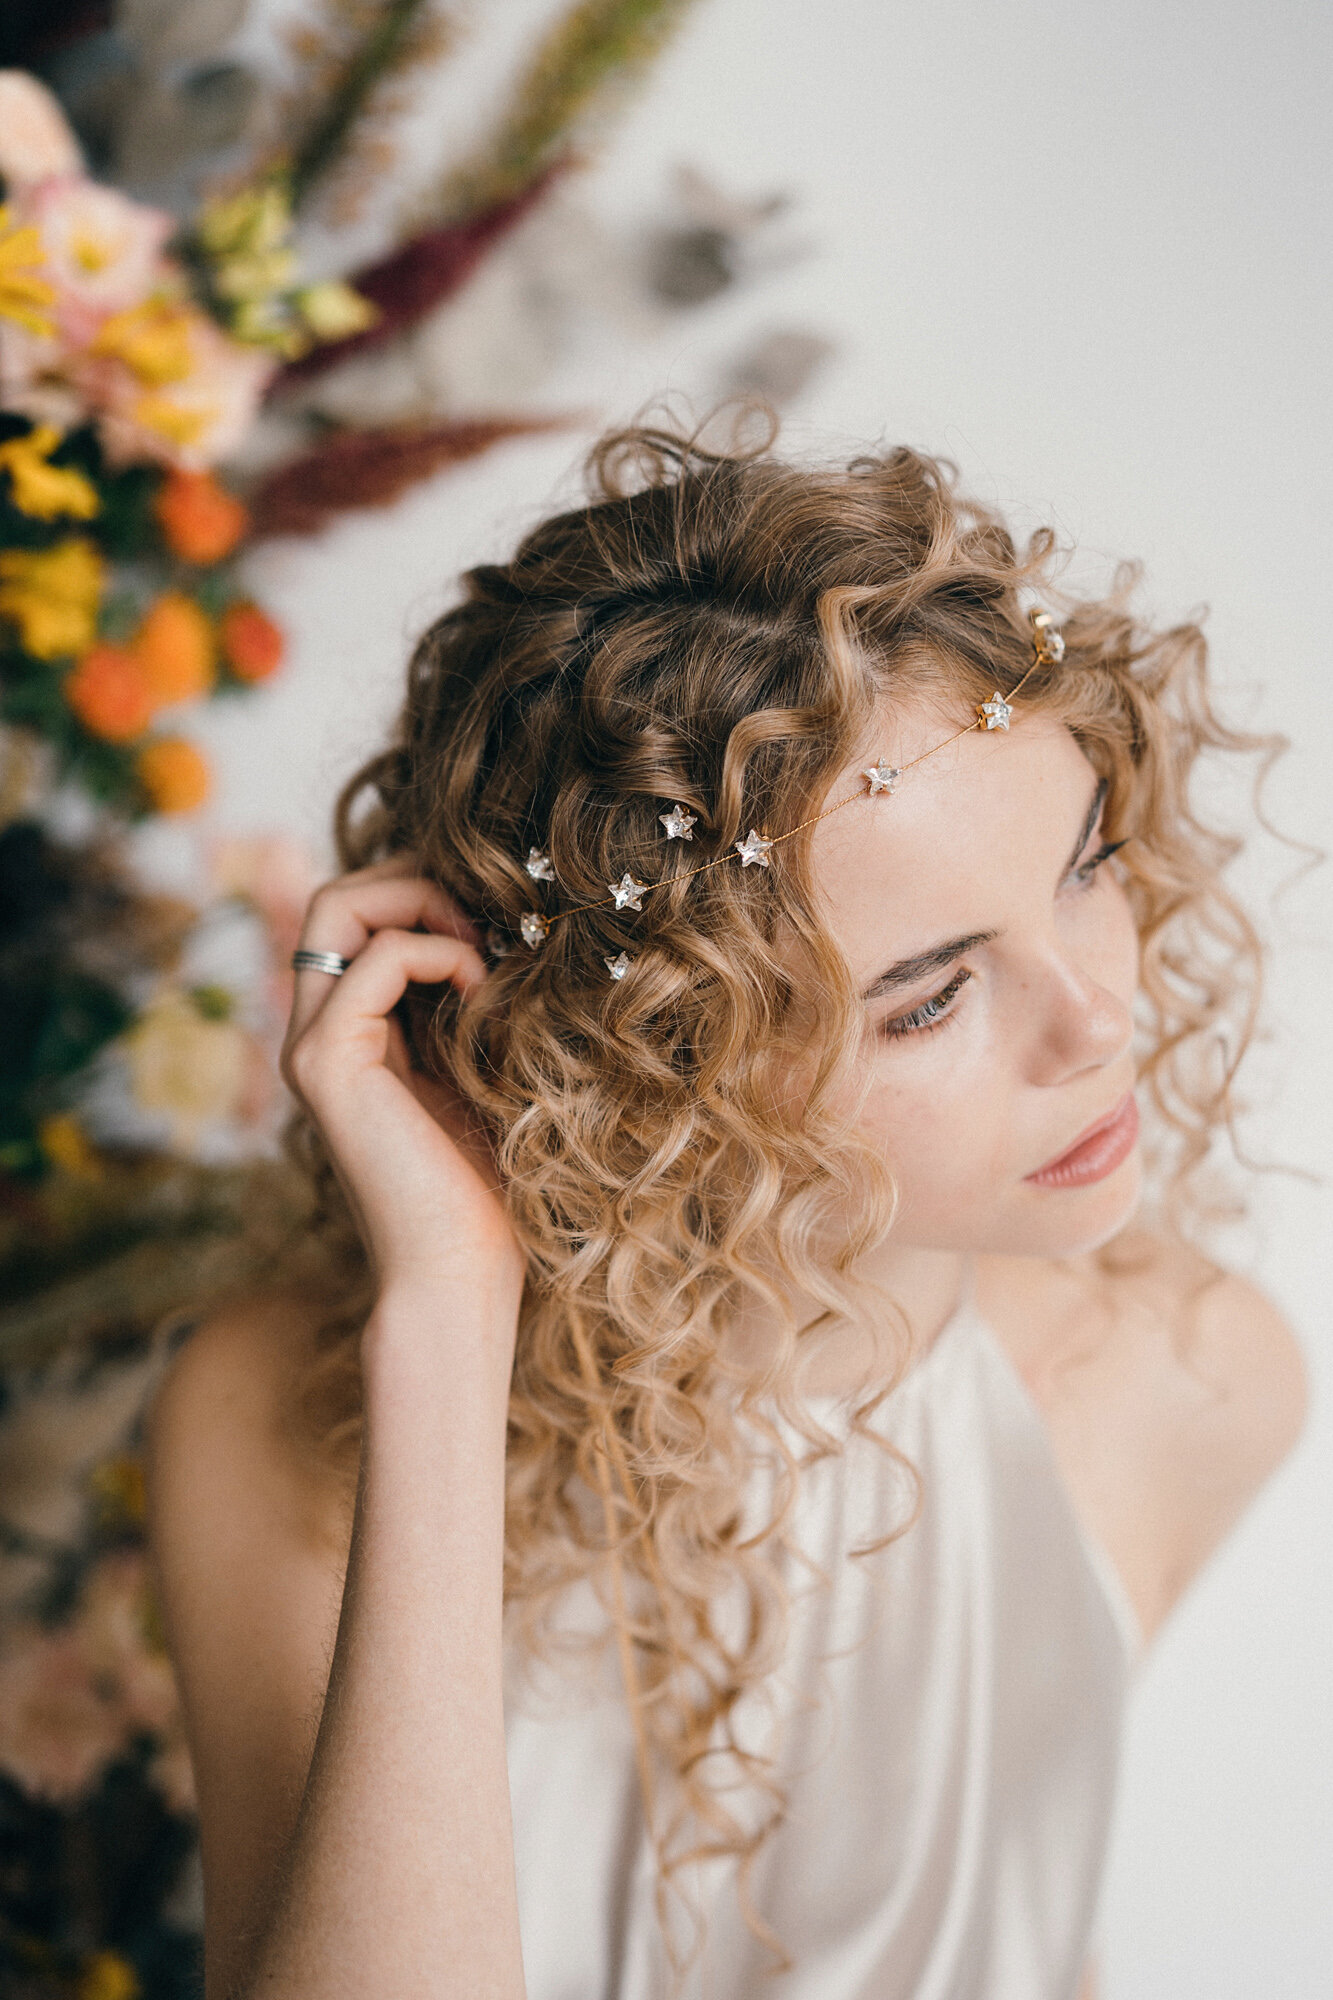 Debbie-Carlisle-Bridal-Accessories-Kate-Beaumont-Wedding-Gowns-Sheffield-Yorkshire-UK-4.jpg